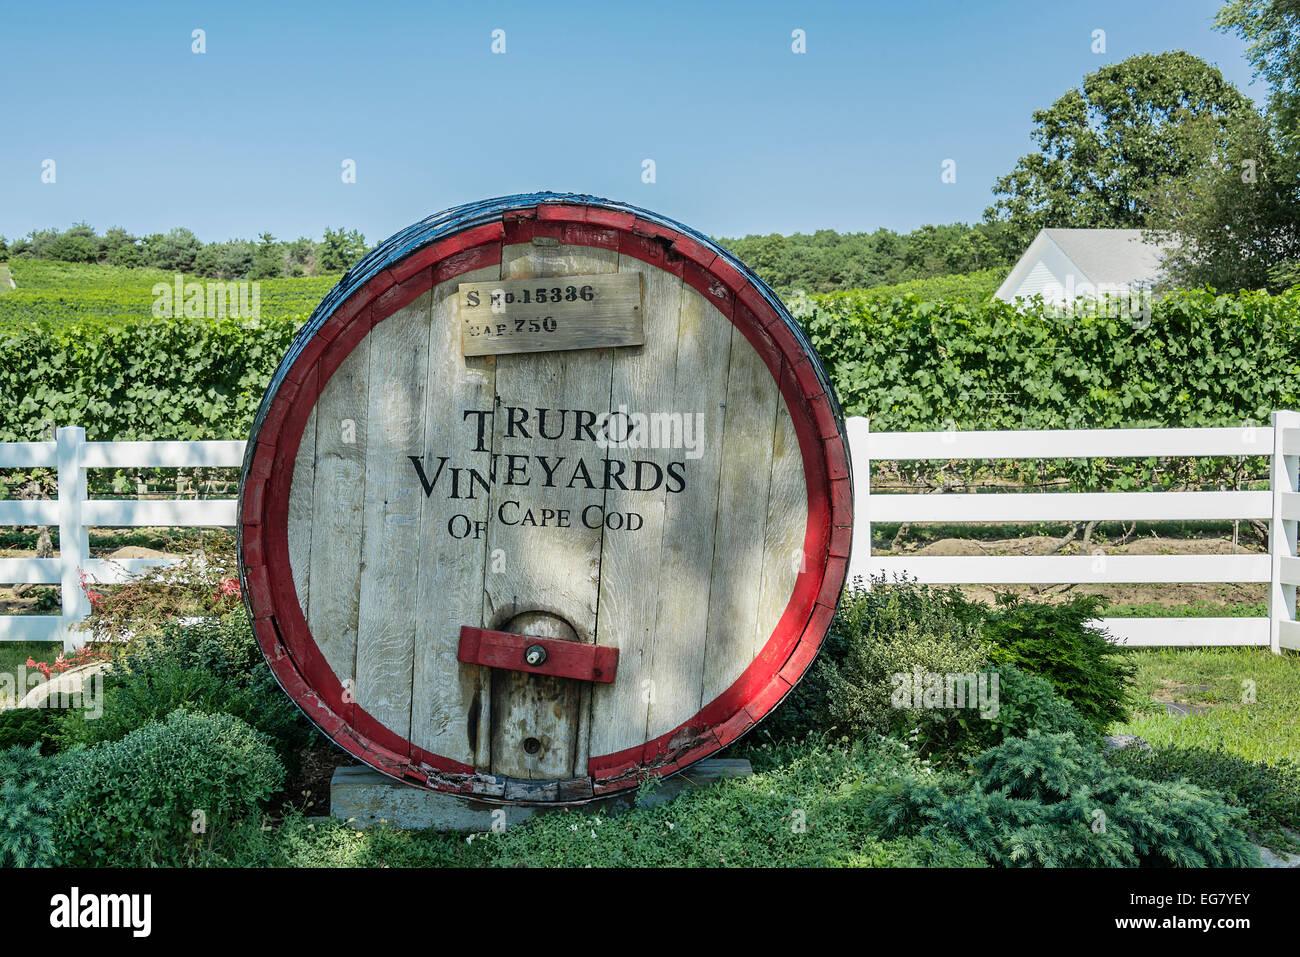 Truro Vineyards, Cape Cod, Massachusetts, USA - Stock Image